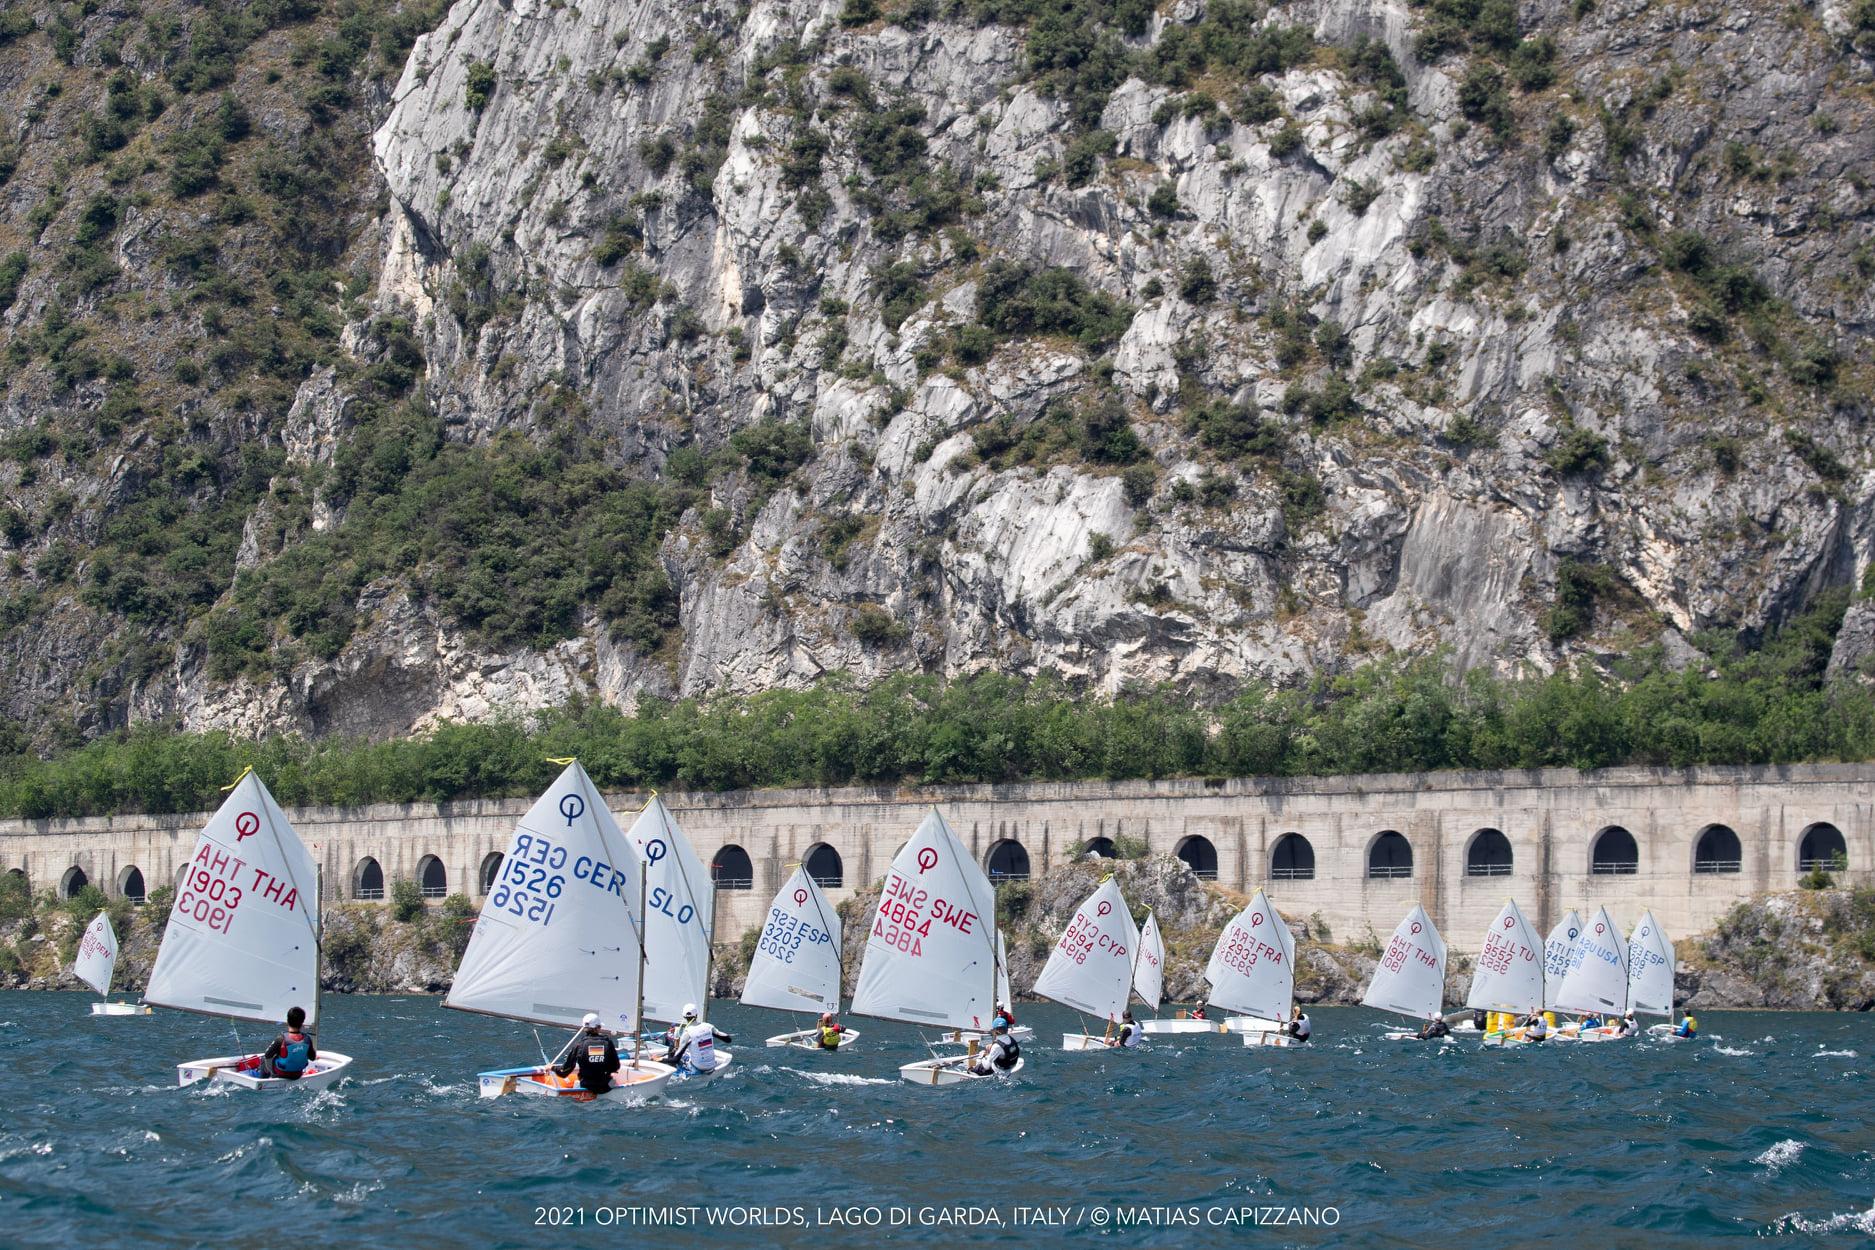 Picturesque background for a regatta